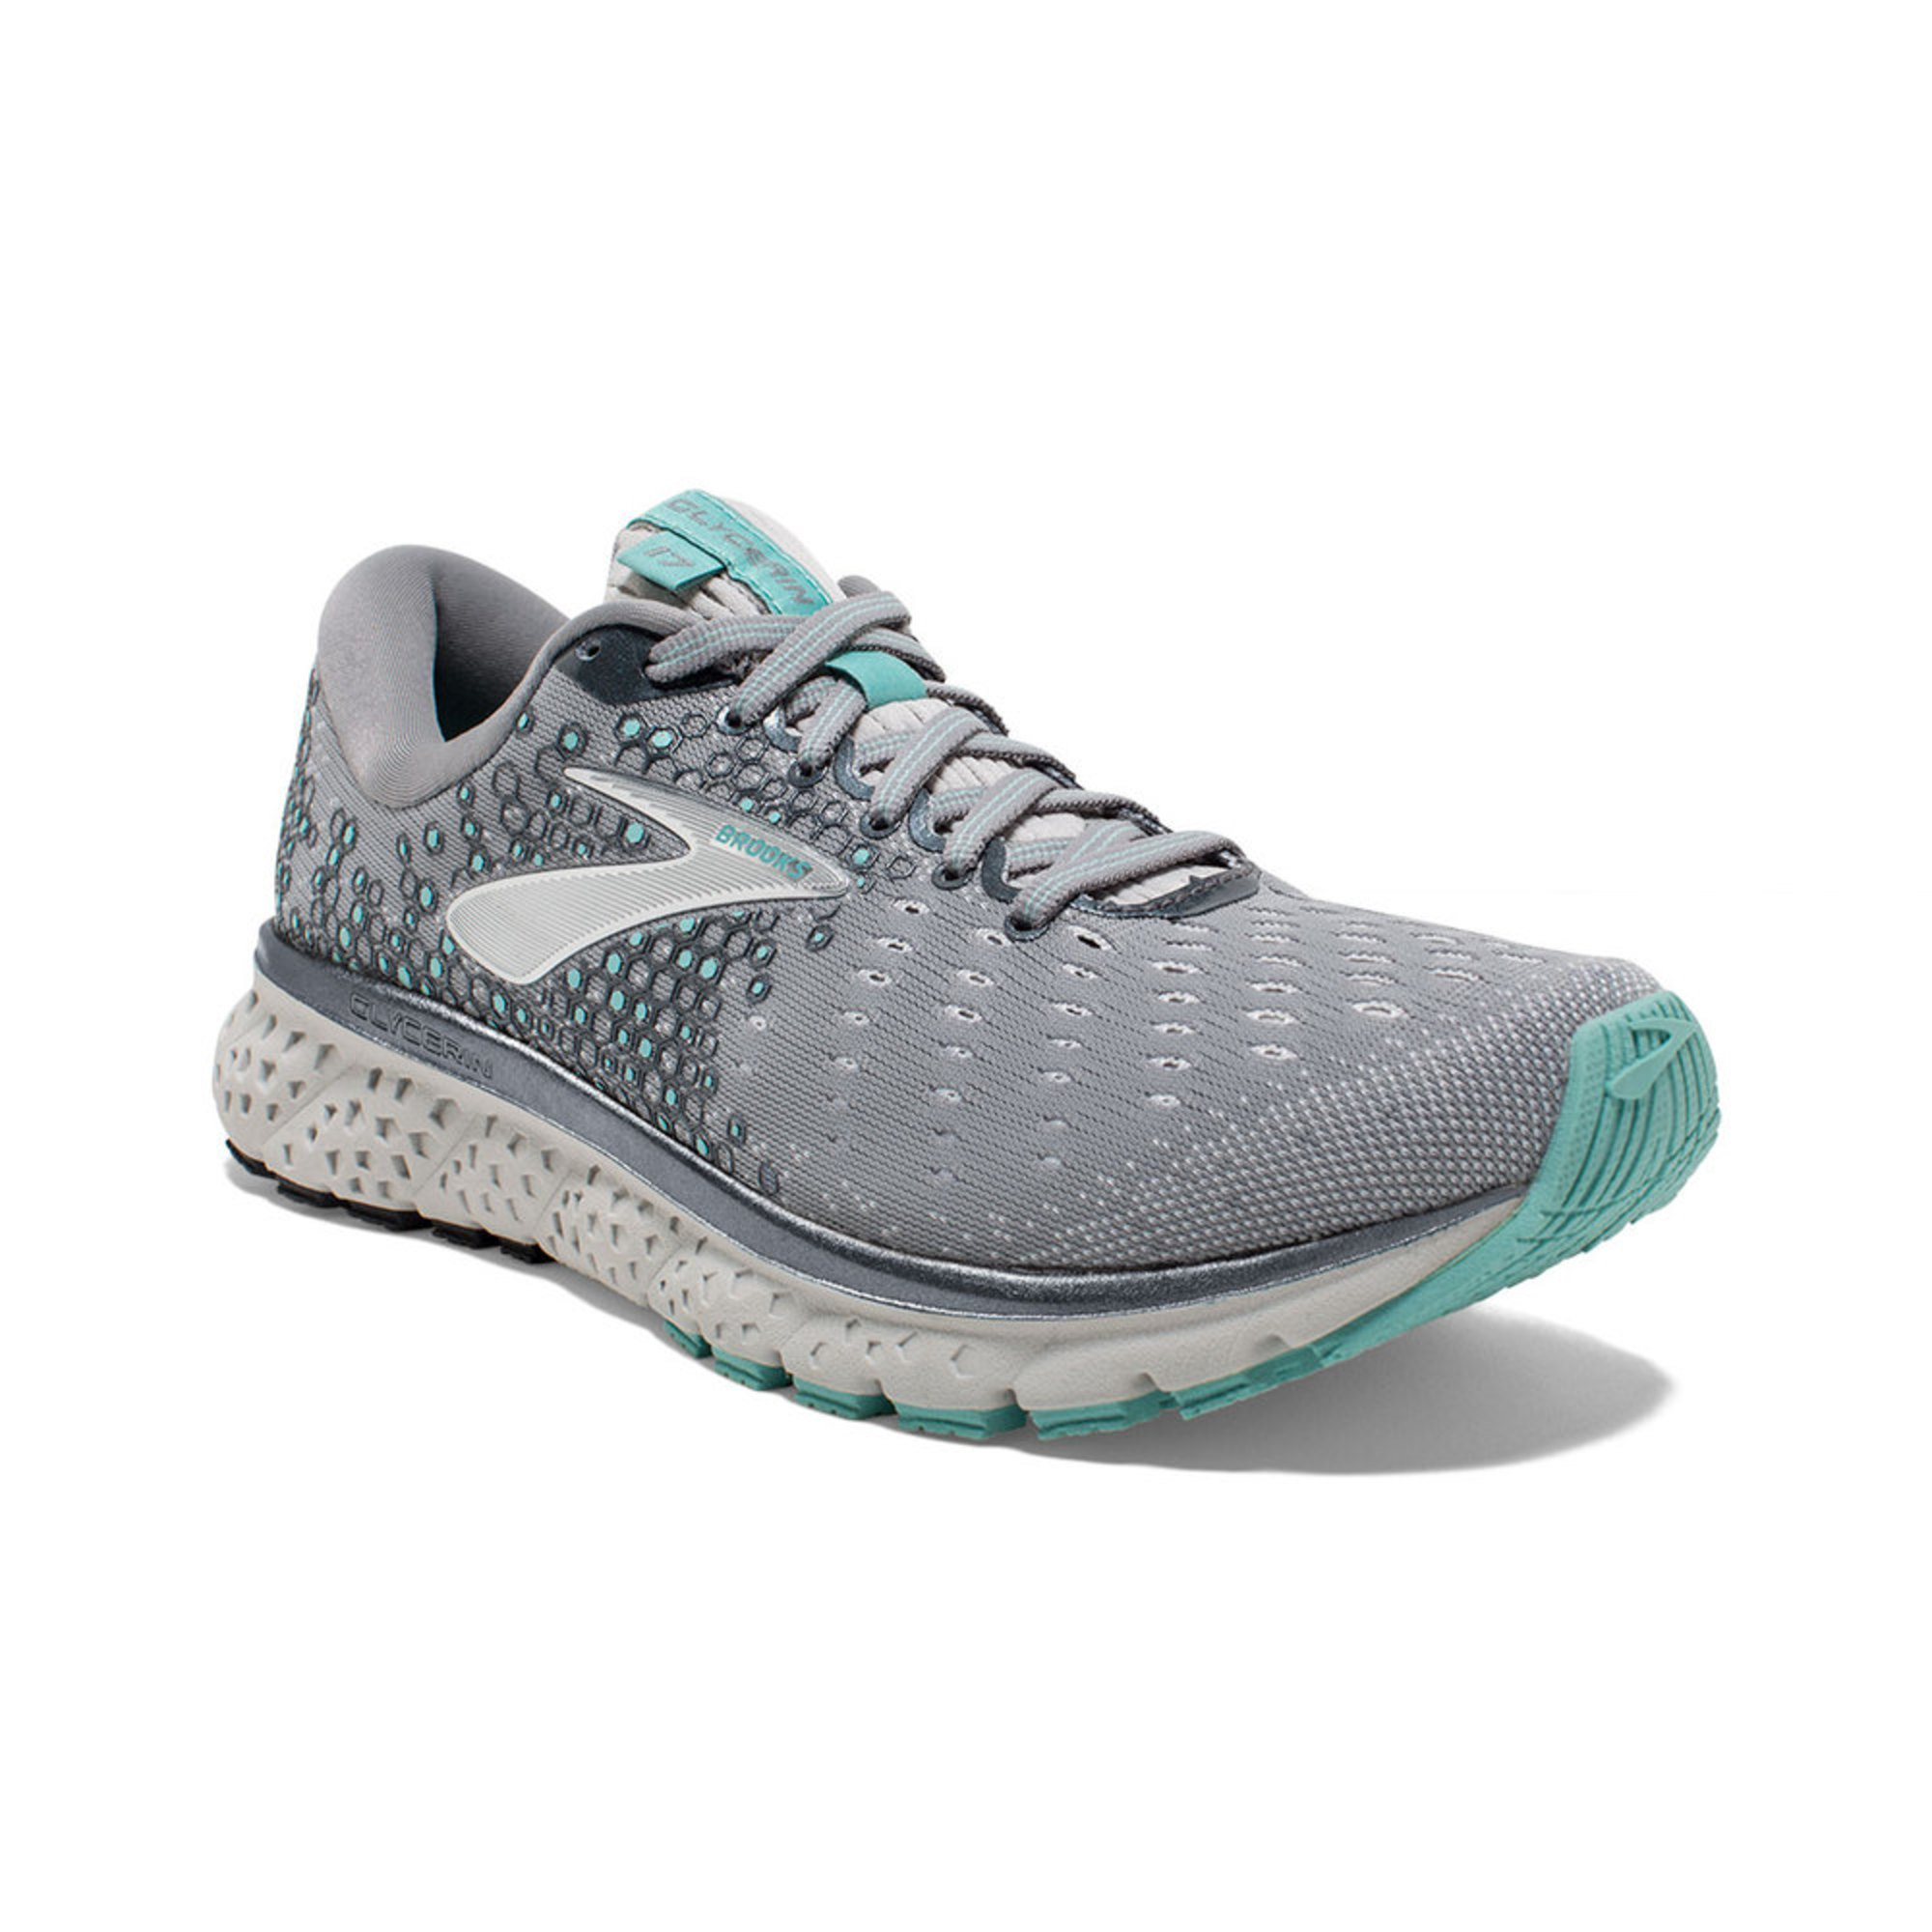 32dbe3bc84b Brooks. Brooks Women s Glycerin 17 Running Shoe